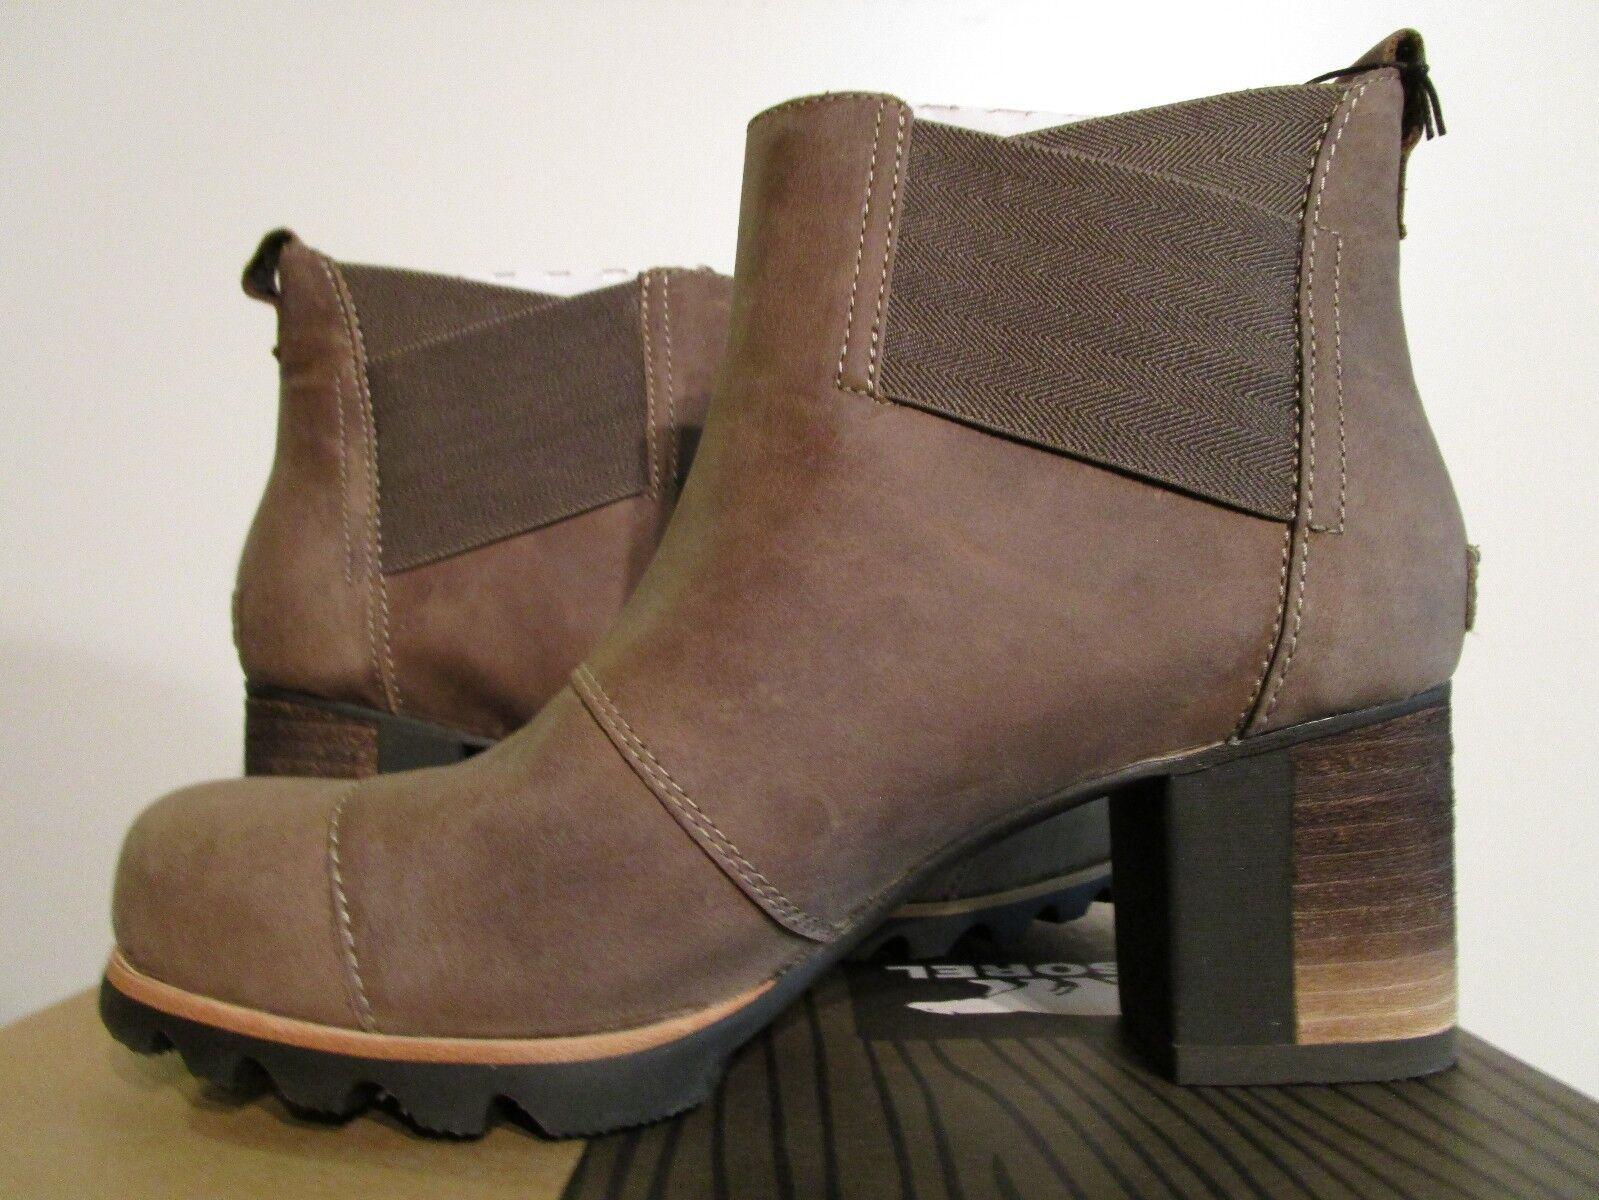 Womens Sorel Addington Chelsea Leather Fashion Pull On Waterproof Boots - Pebble